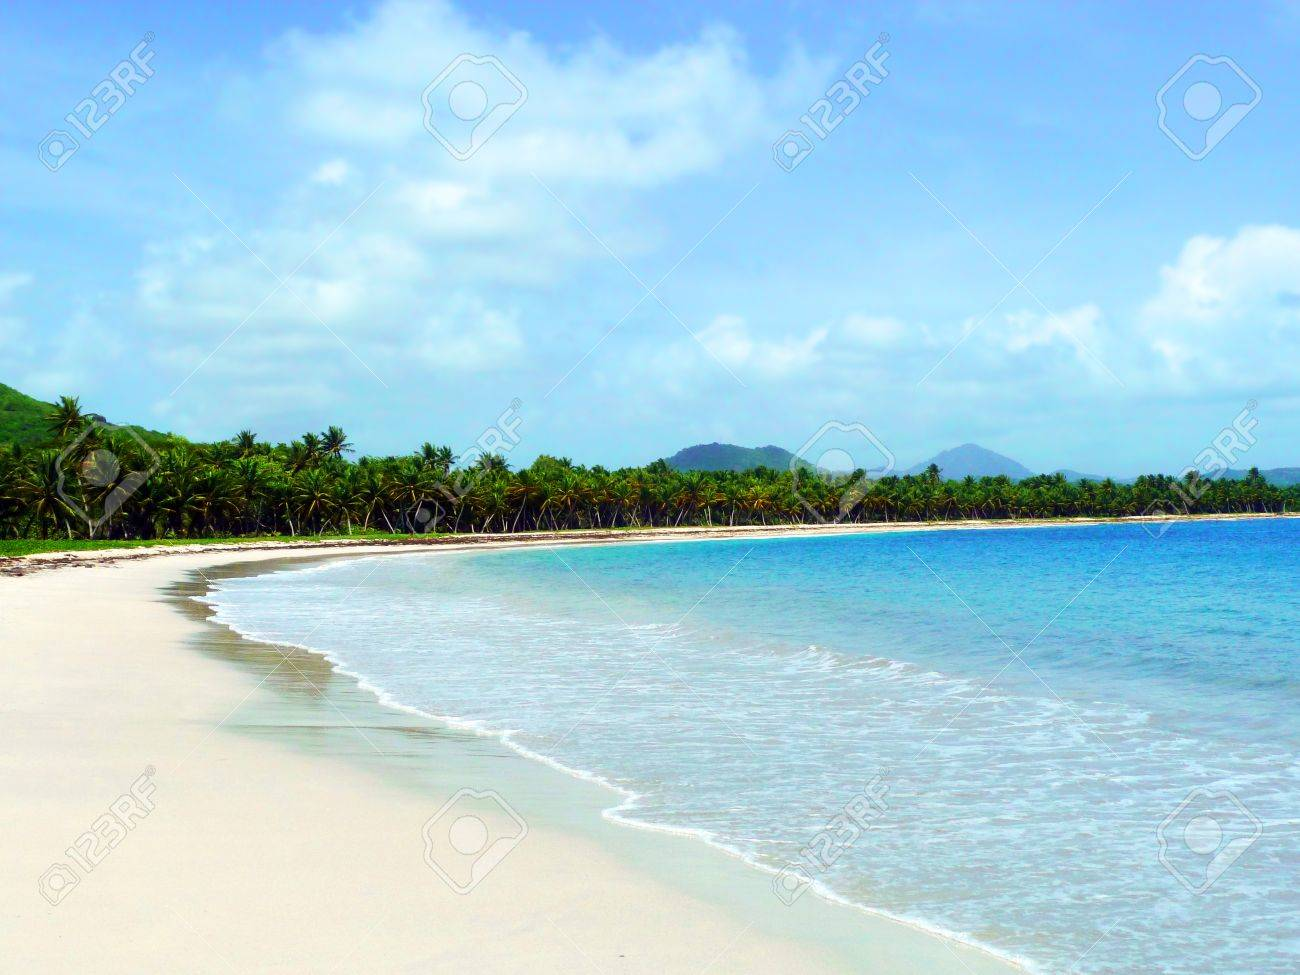 Carribean Wild Beach in Martinique Stock Photo - 13881496